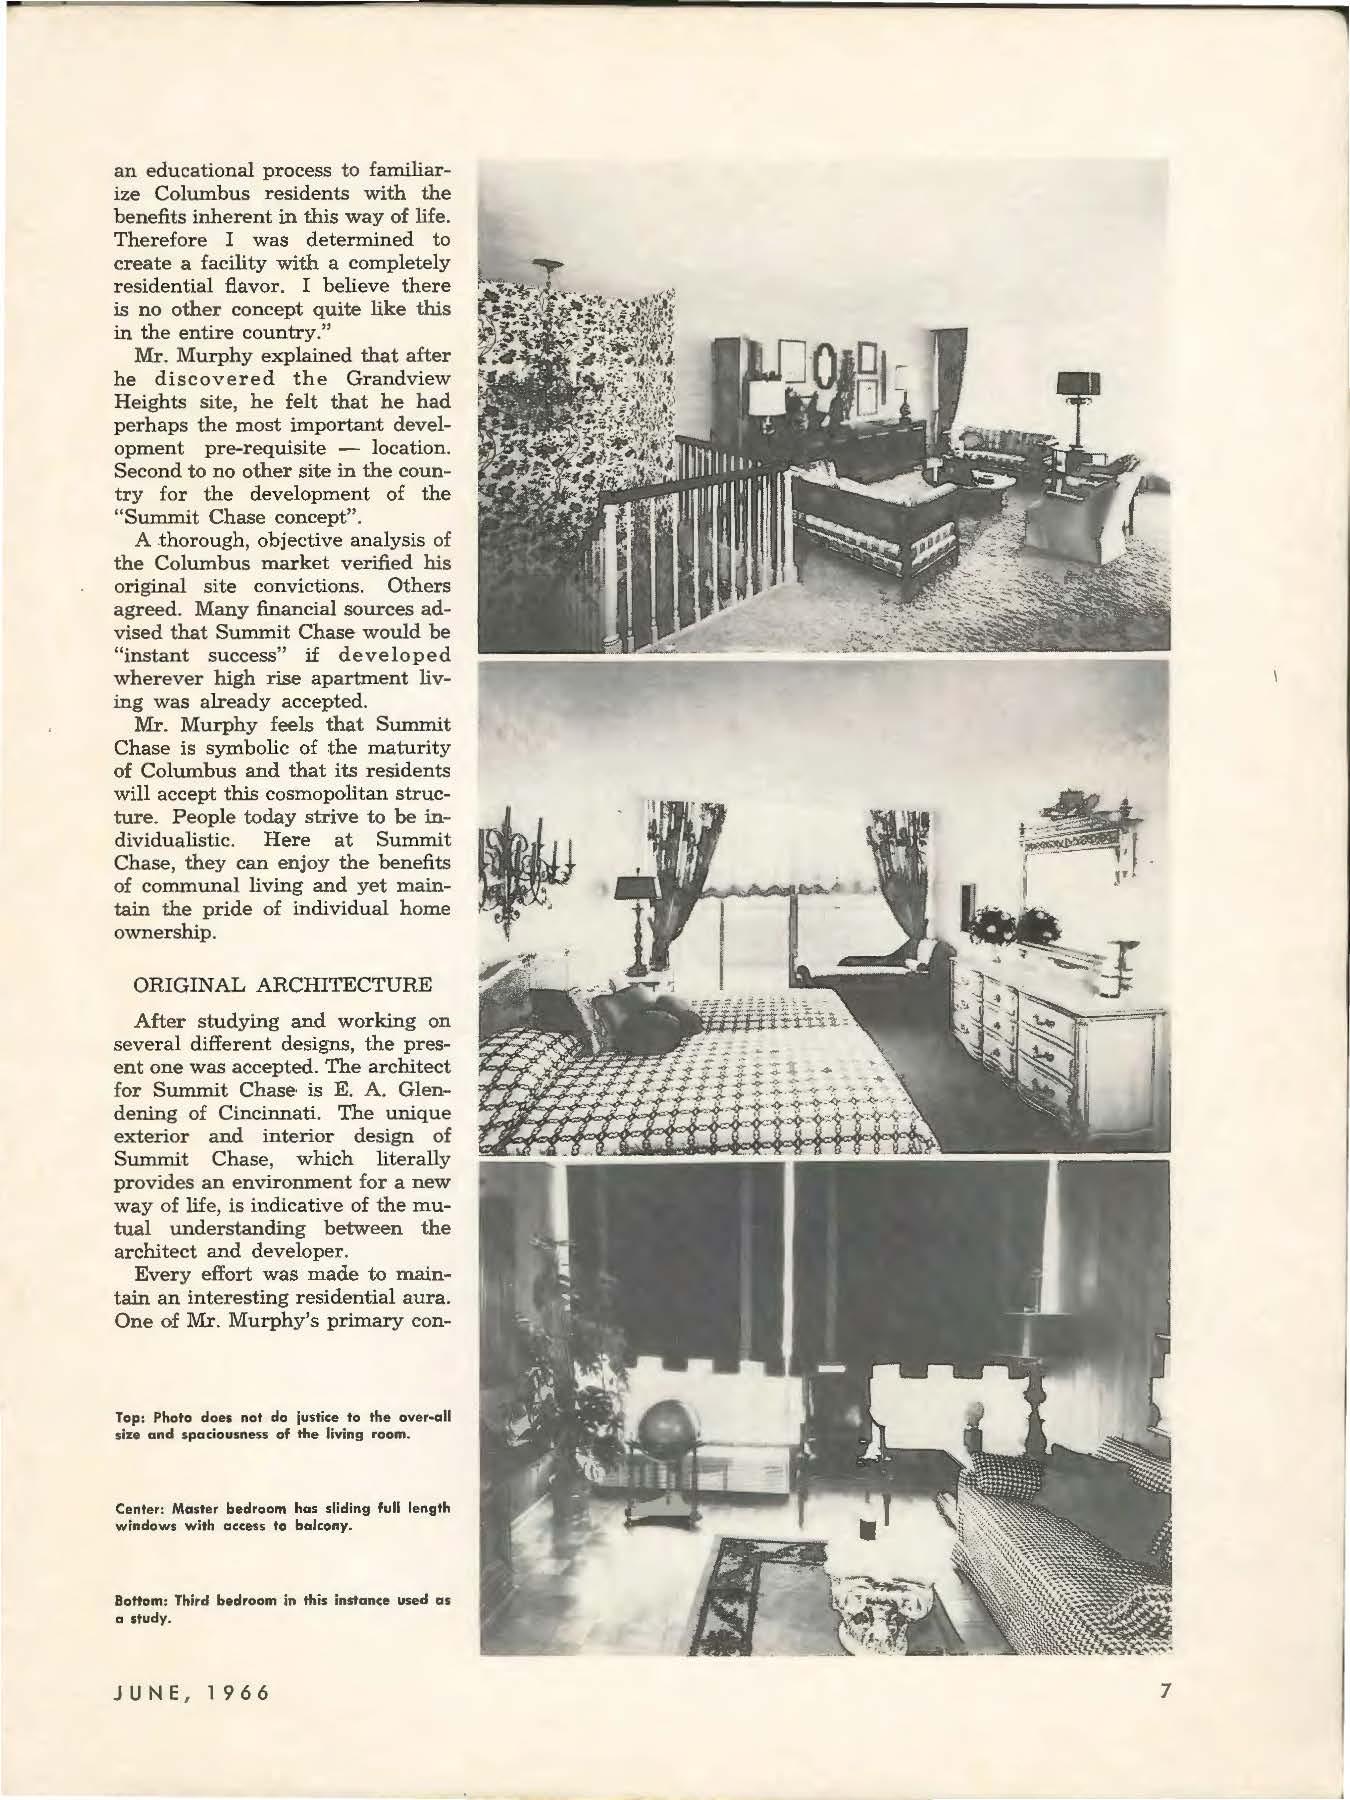 Skyline 1966_Page_07.jpg